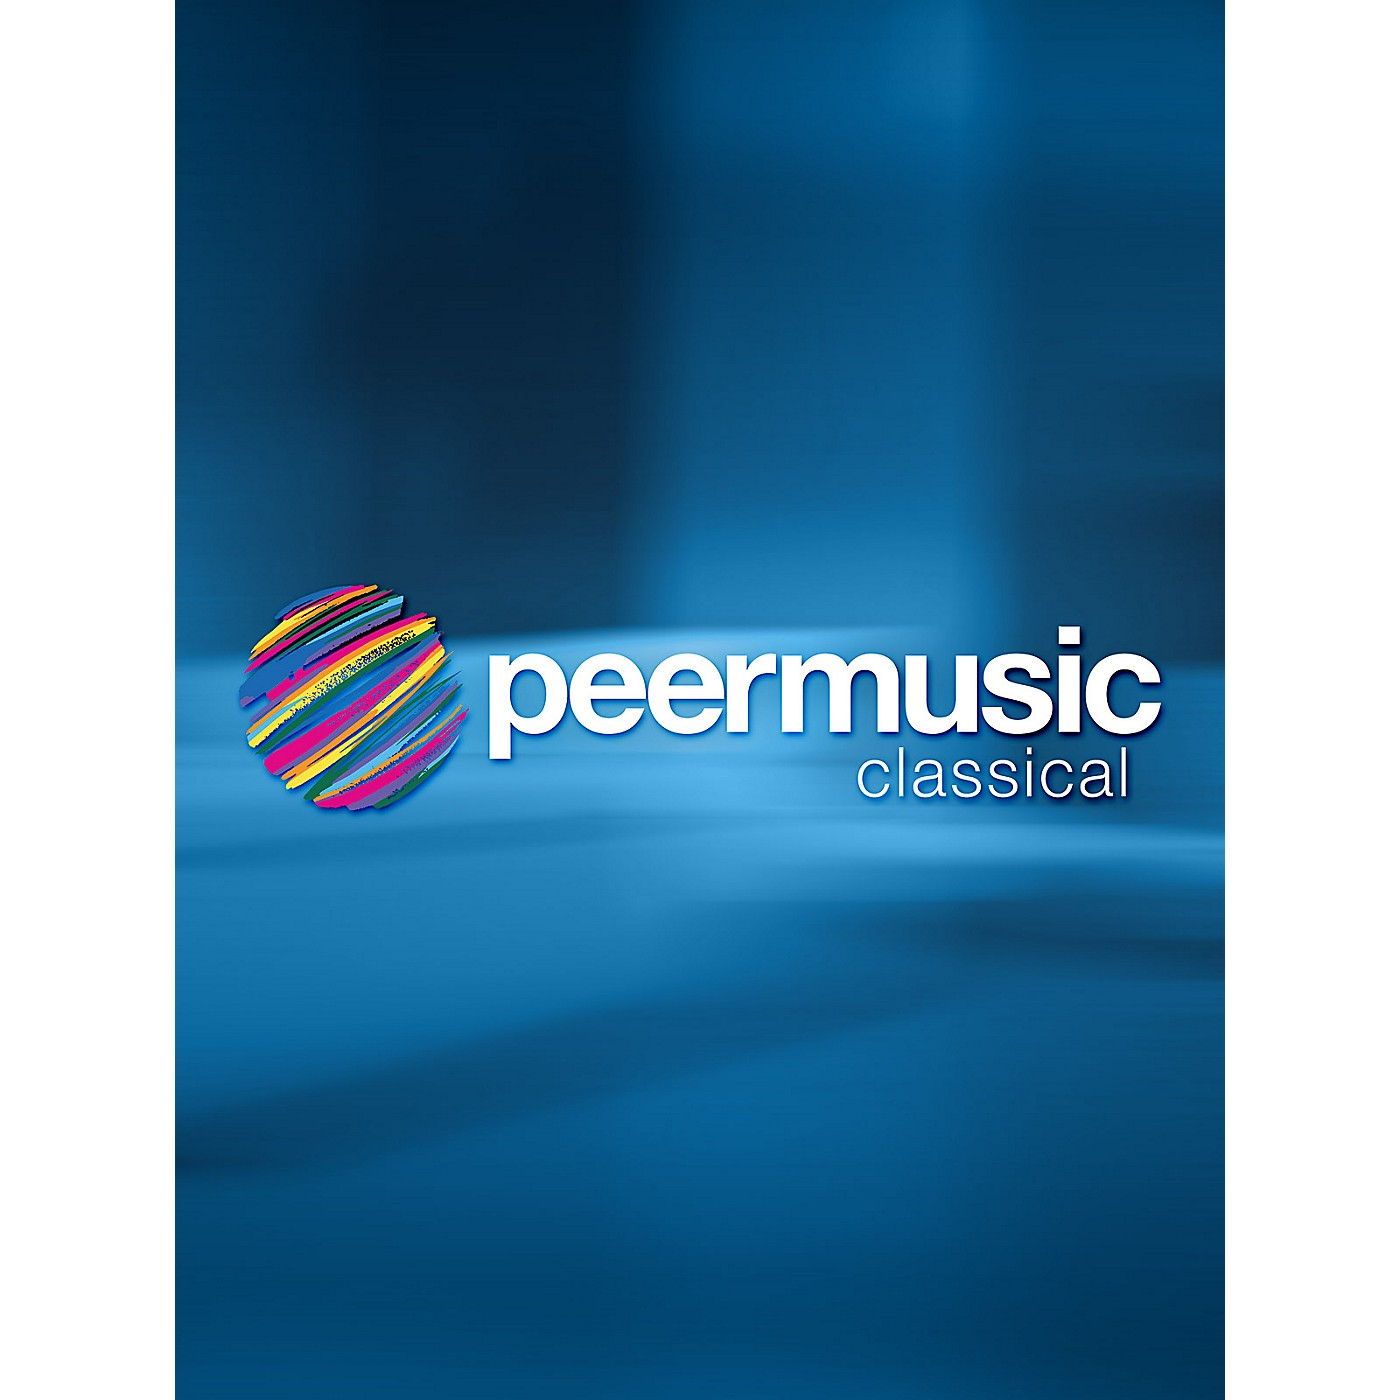 Peer Music Technical Studies Peermusic Classical Series thumbnail